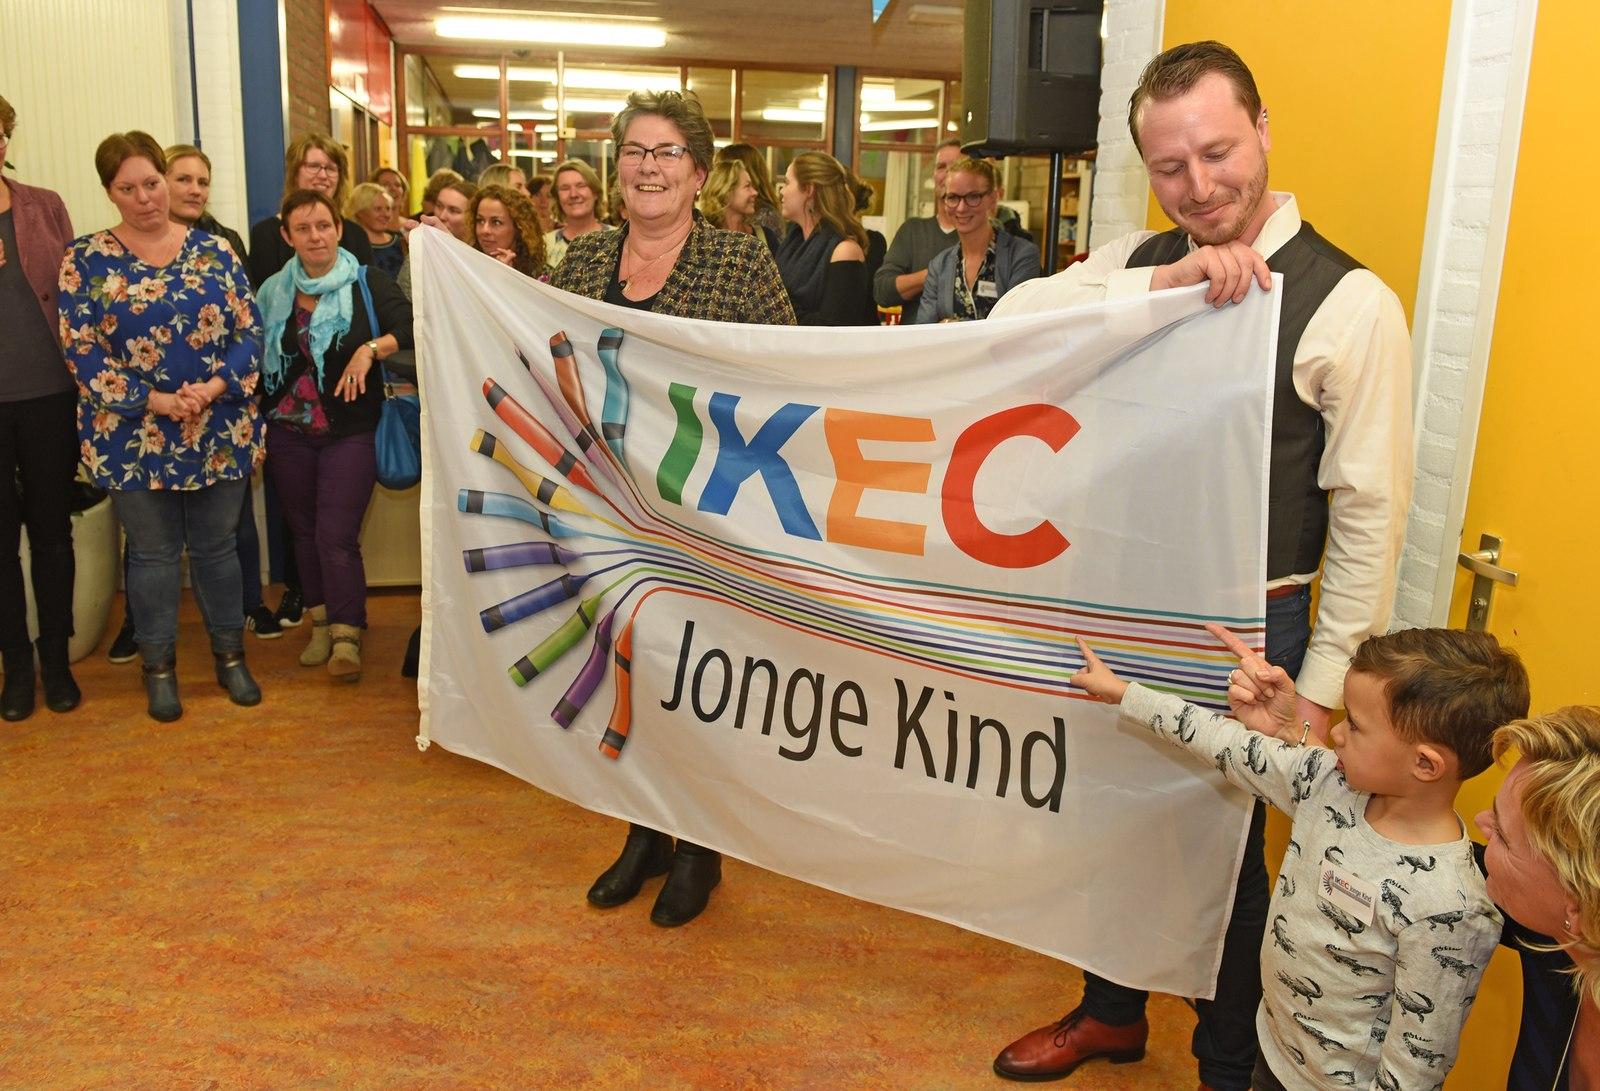 IKEC jonge kind in Hoorn is officieel gestart